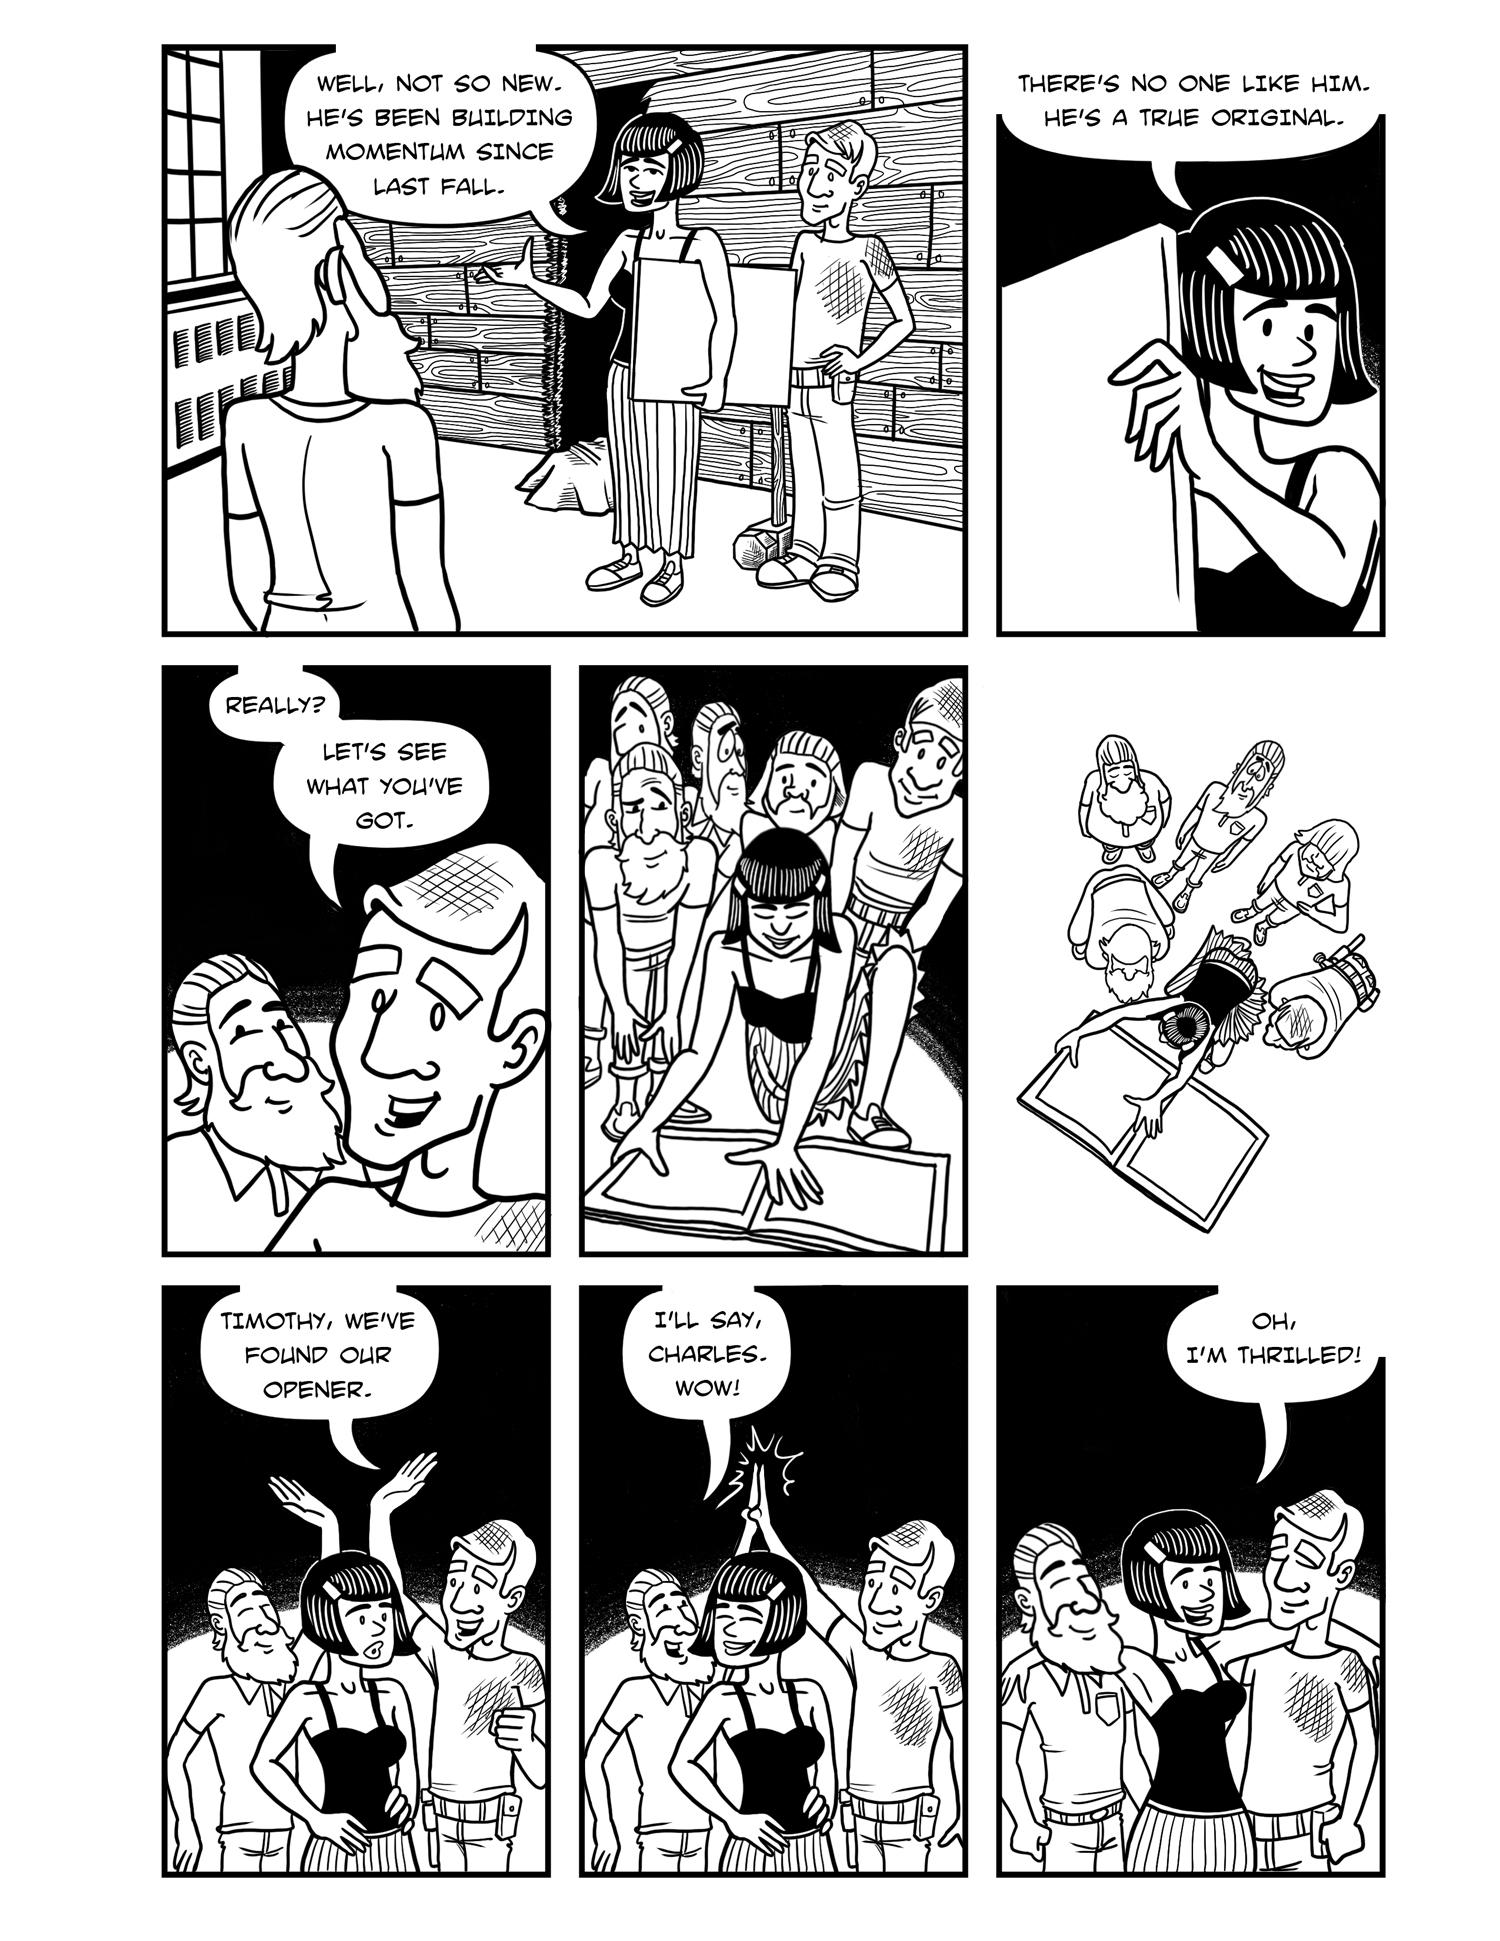 PAGE-343.jpg